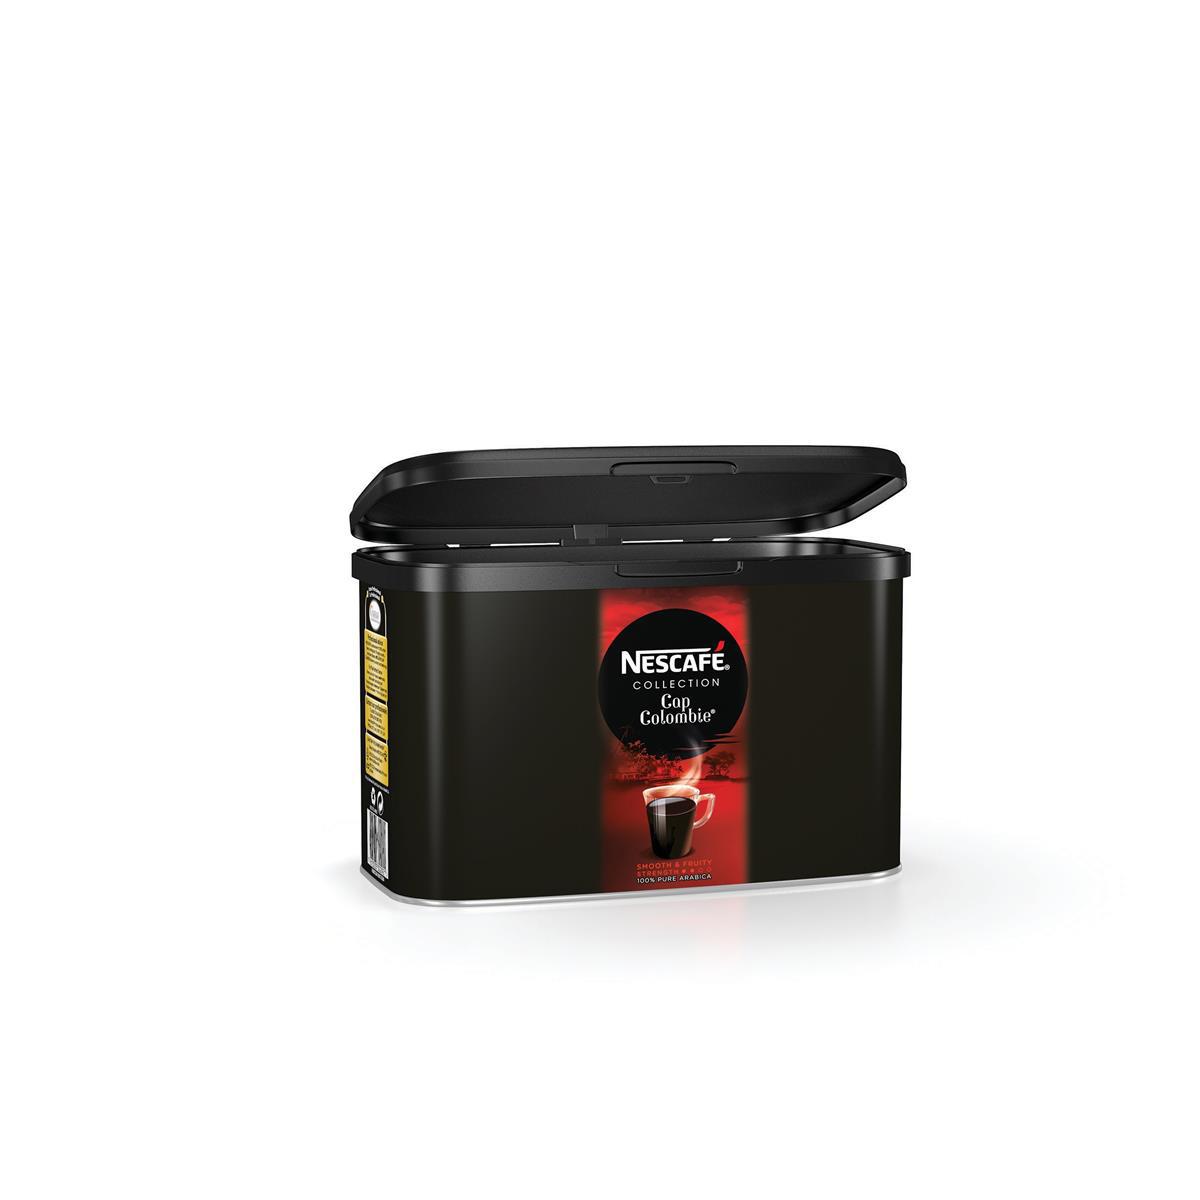 Nescafe Cap Colombie Instant Coffee Tin 500g Ref 12284223